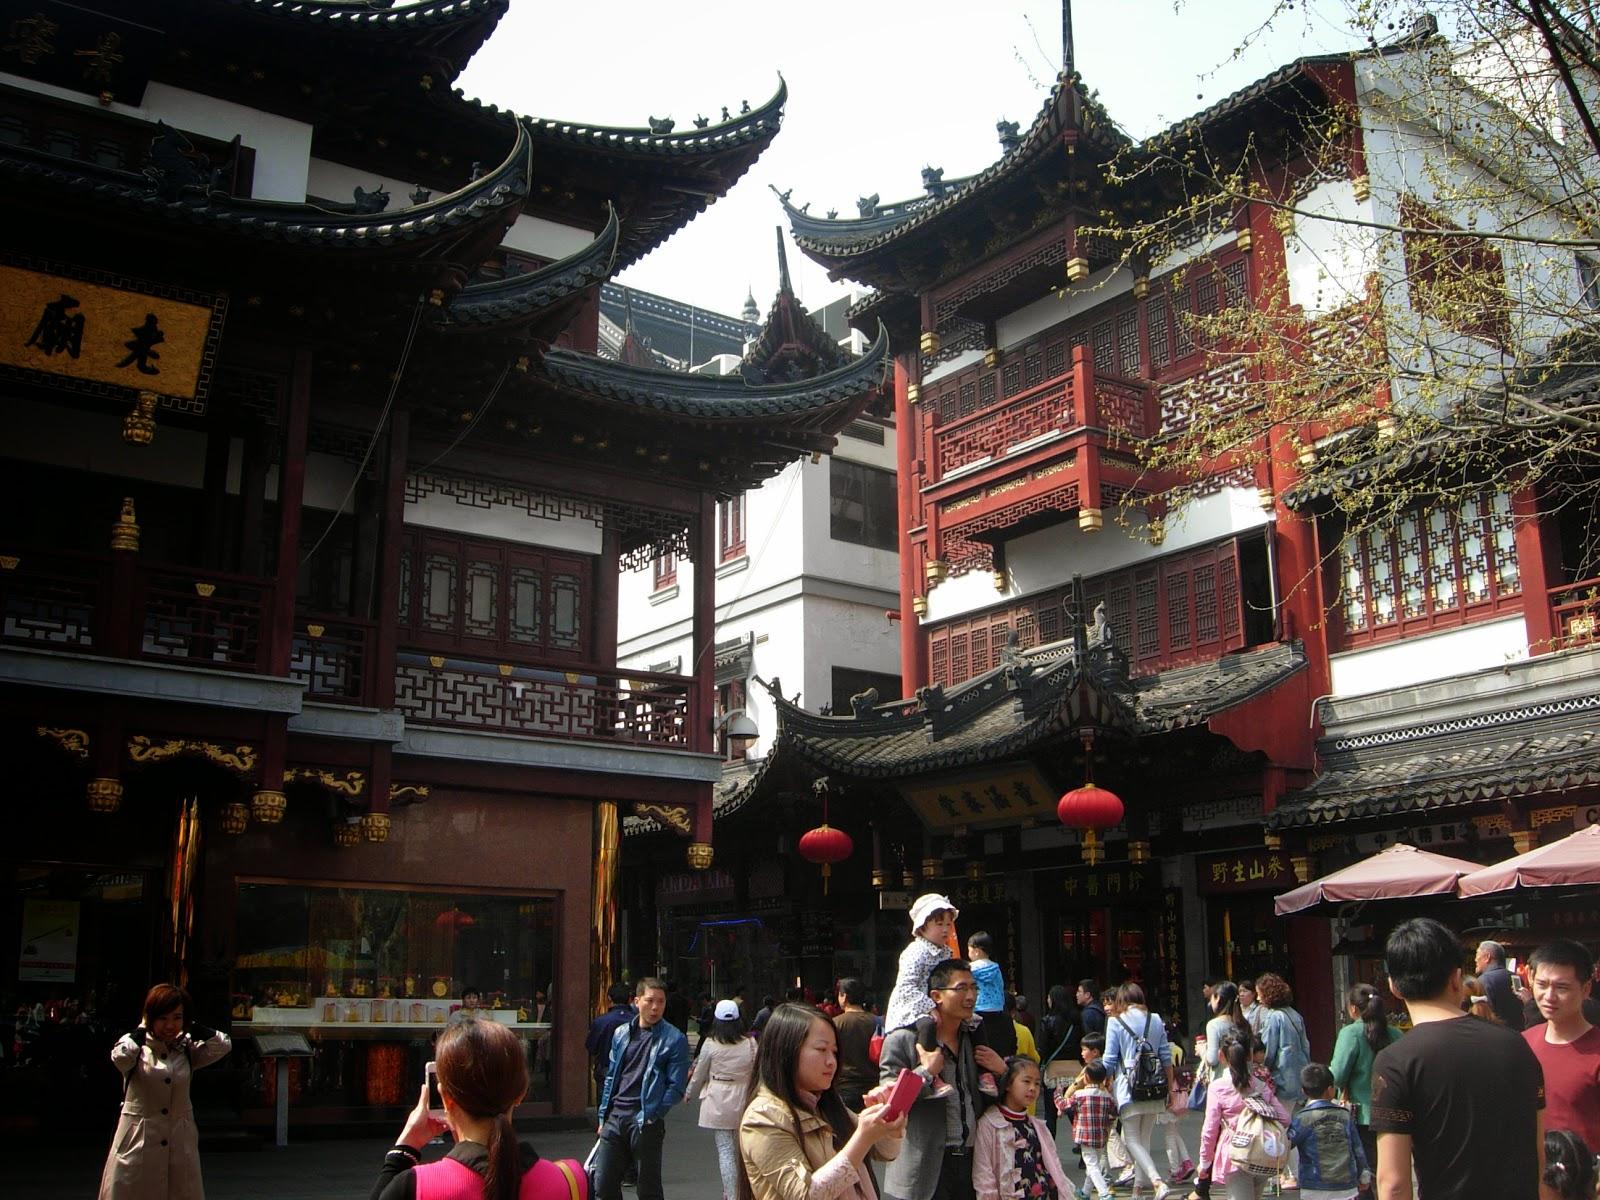 Pizza fichi e zighin shanghai tutti pazzi per lo shopping - Giardino del mandarino yu ...